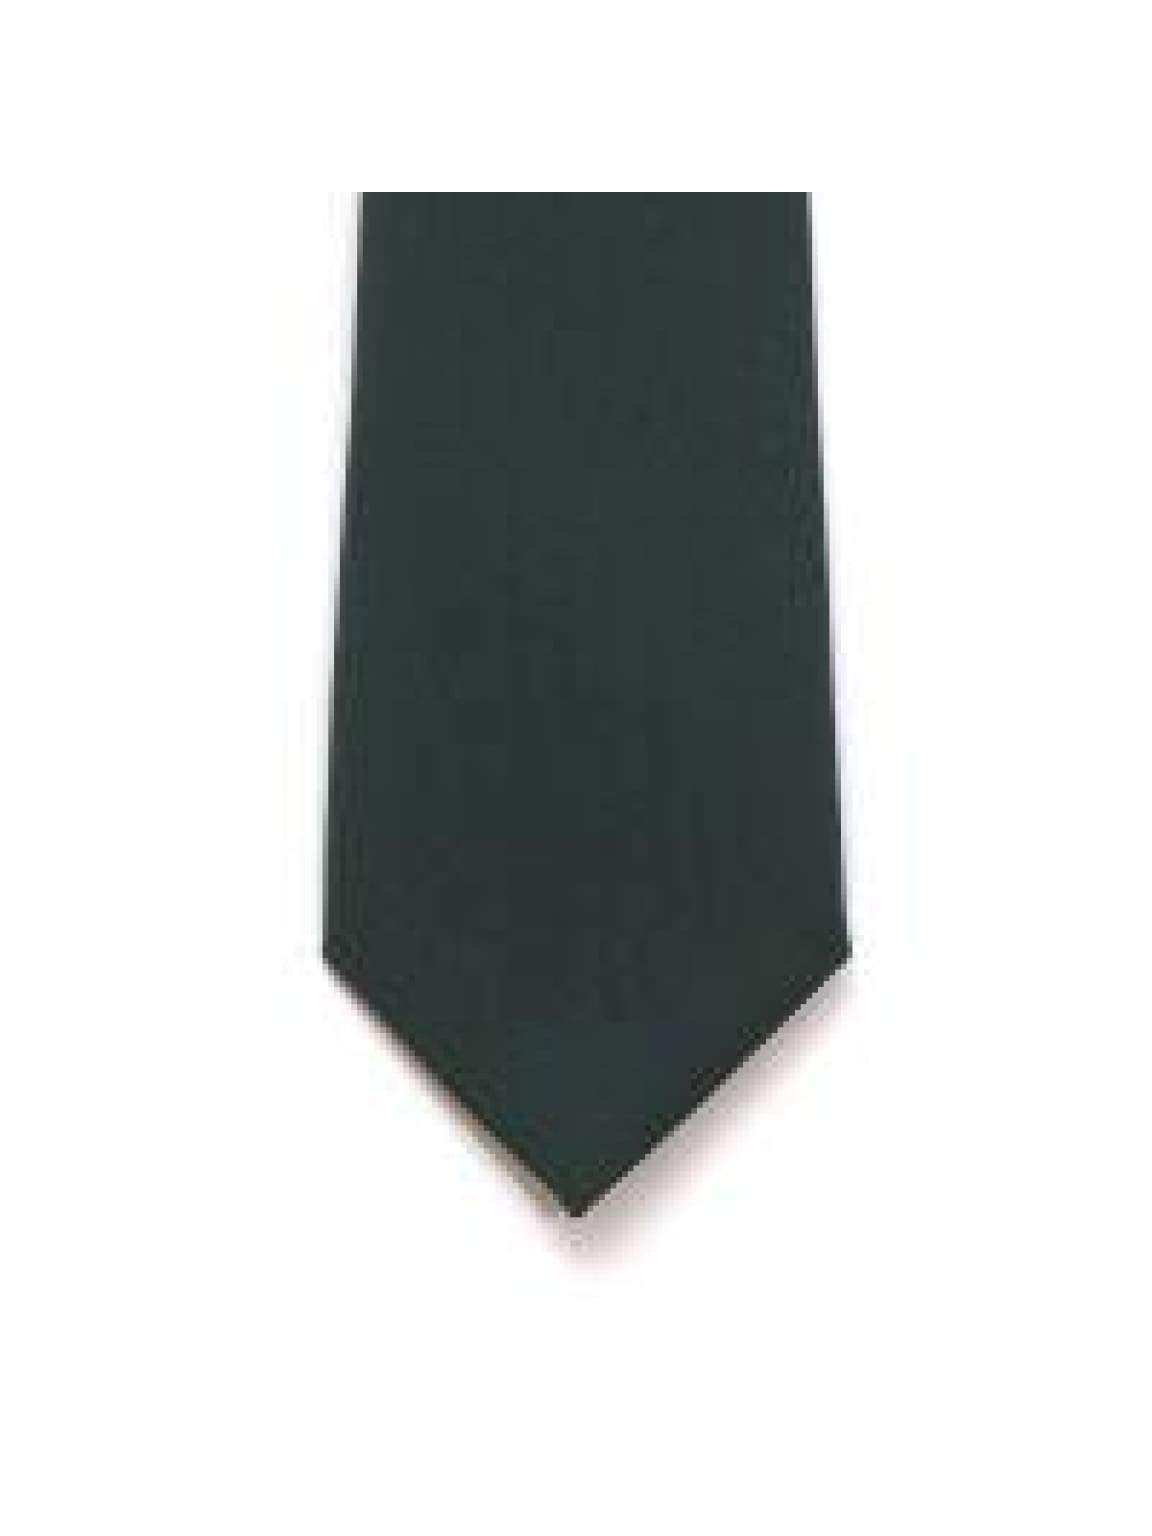 LA Smith Bottle Green Skinny Panama Tie - Accessories